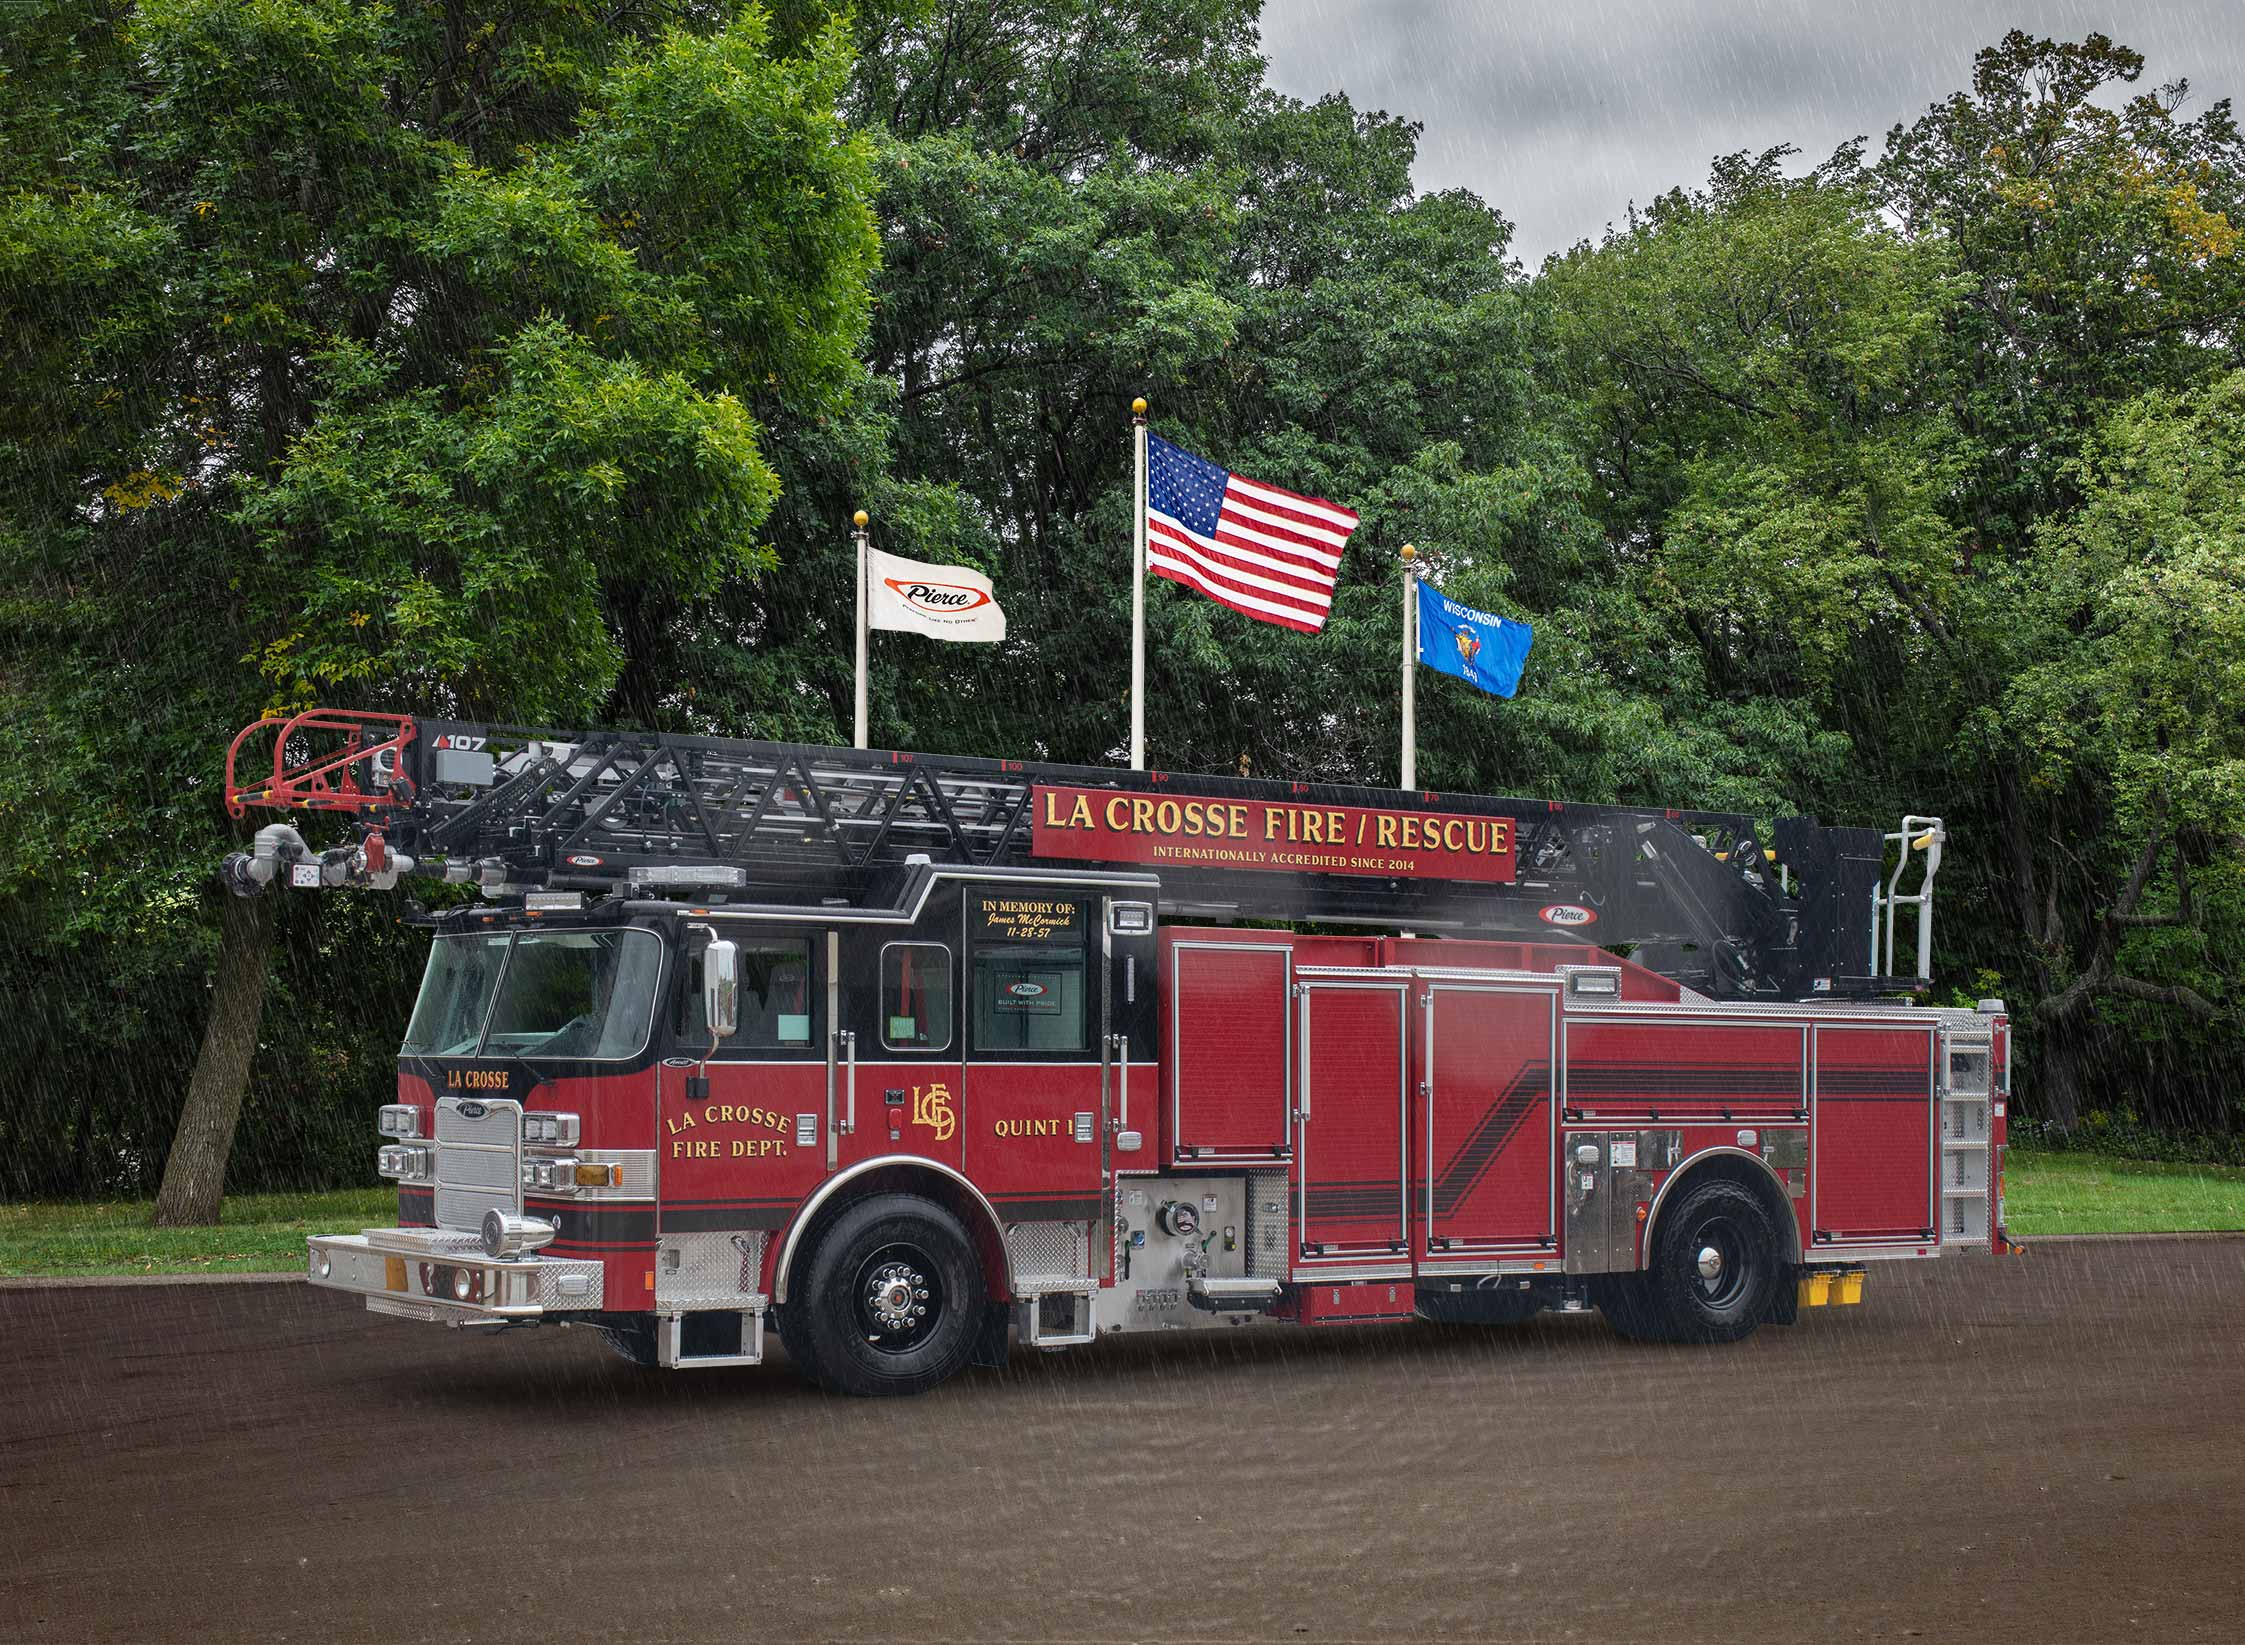 La Crosse Fire Department - Aerial